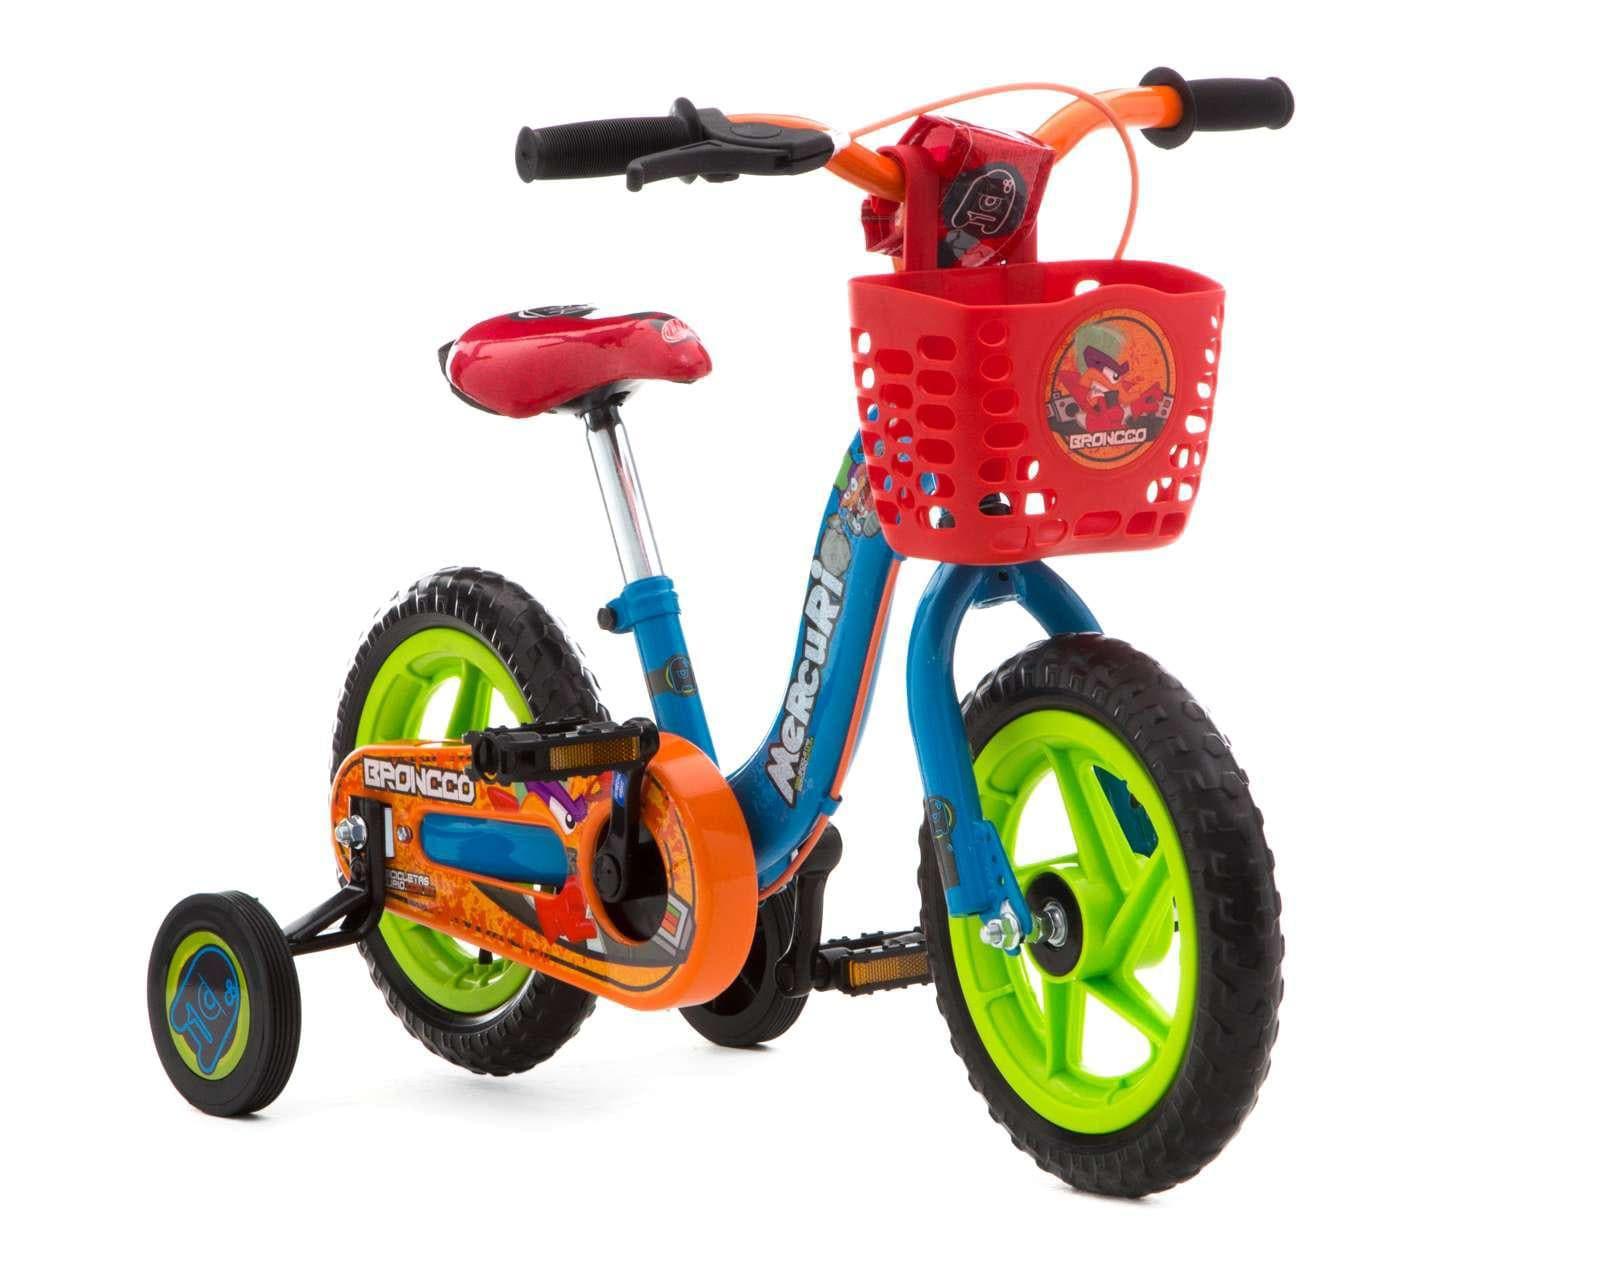 Bicicleta Infantil Broncco 12